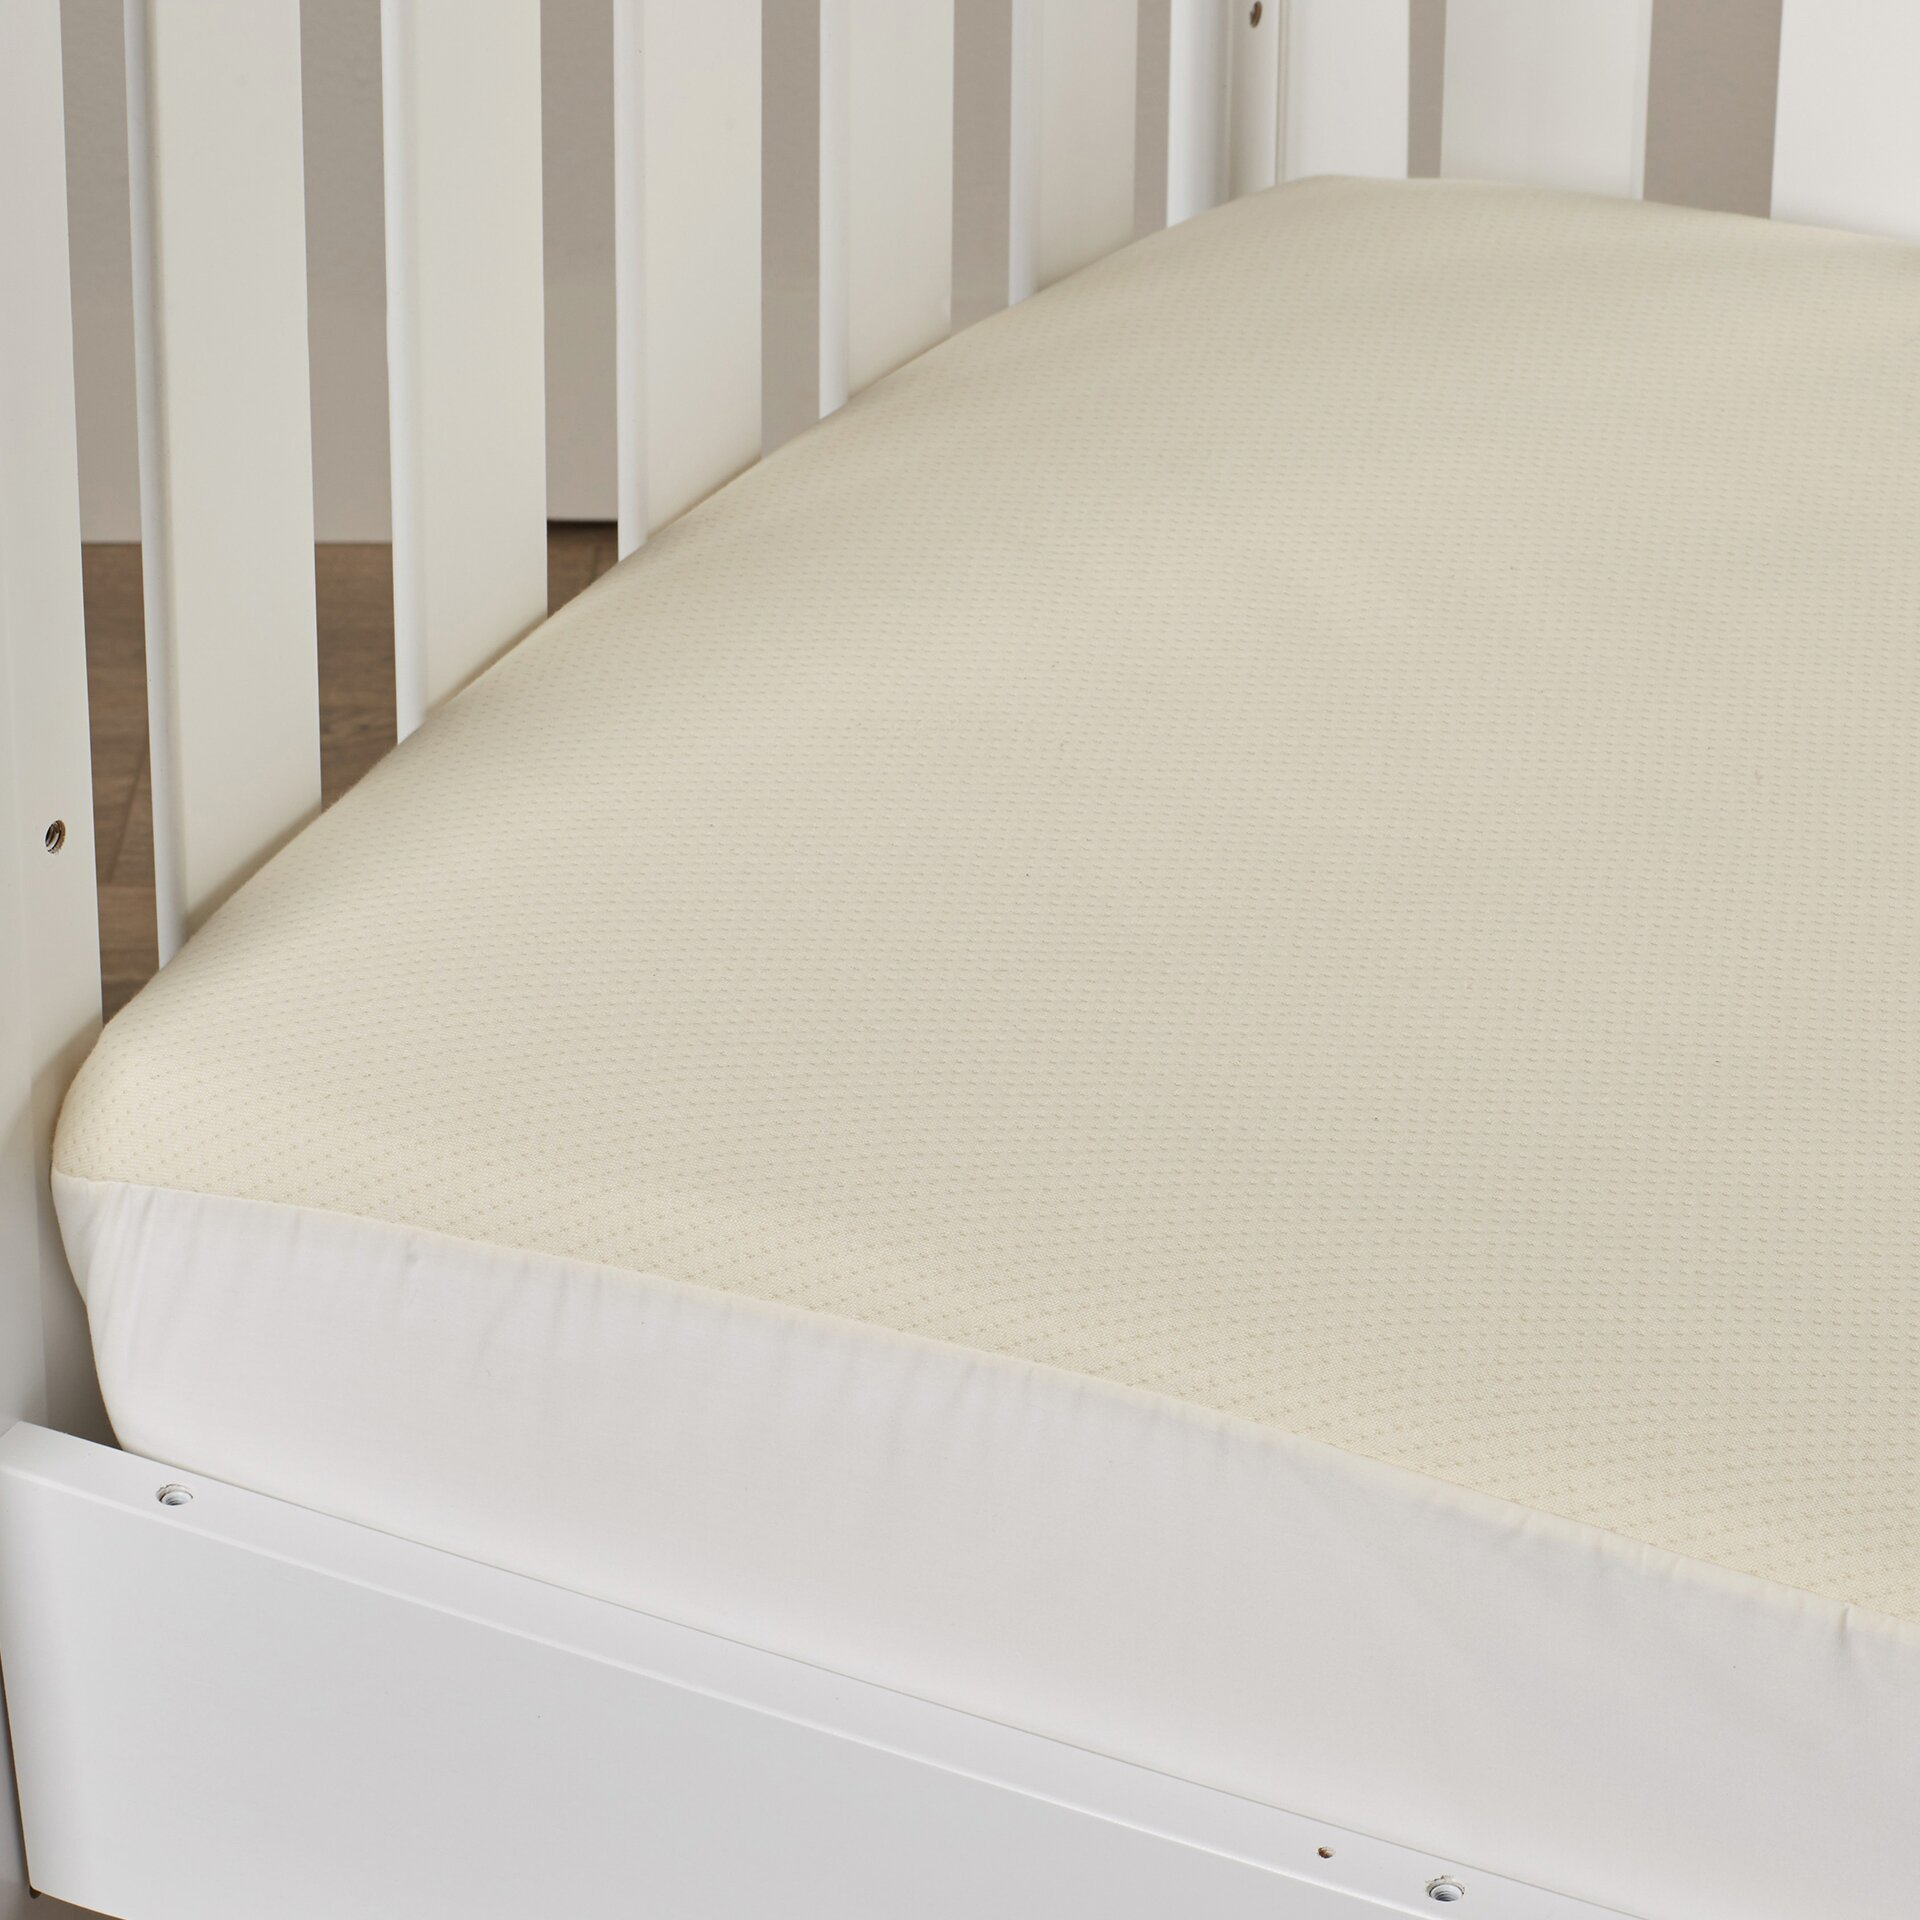 viv rae godstowe organic cotton crib fitted mattress